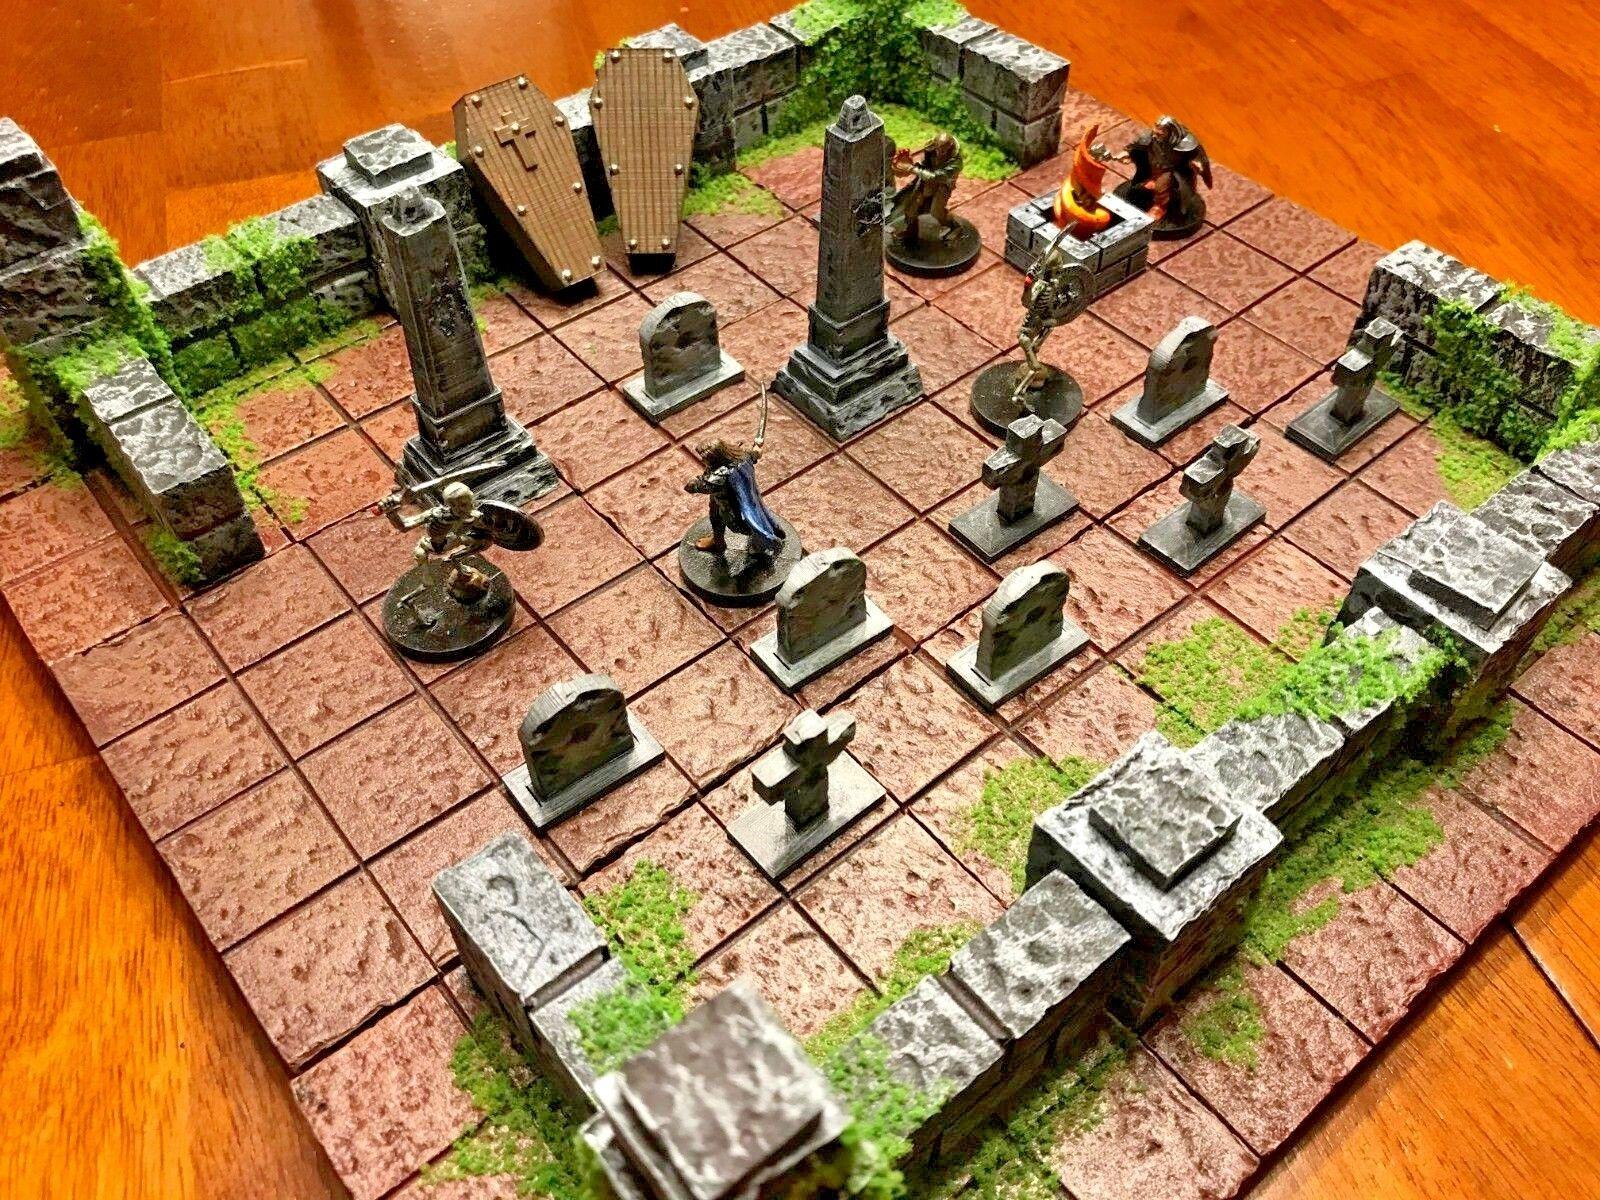 Dungeon Cemetery Set 2  28mm Terrain Dungeons & Dragons Pathfinder d&d Wargame